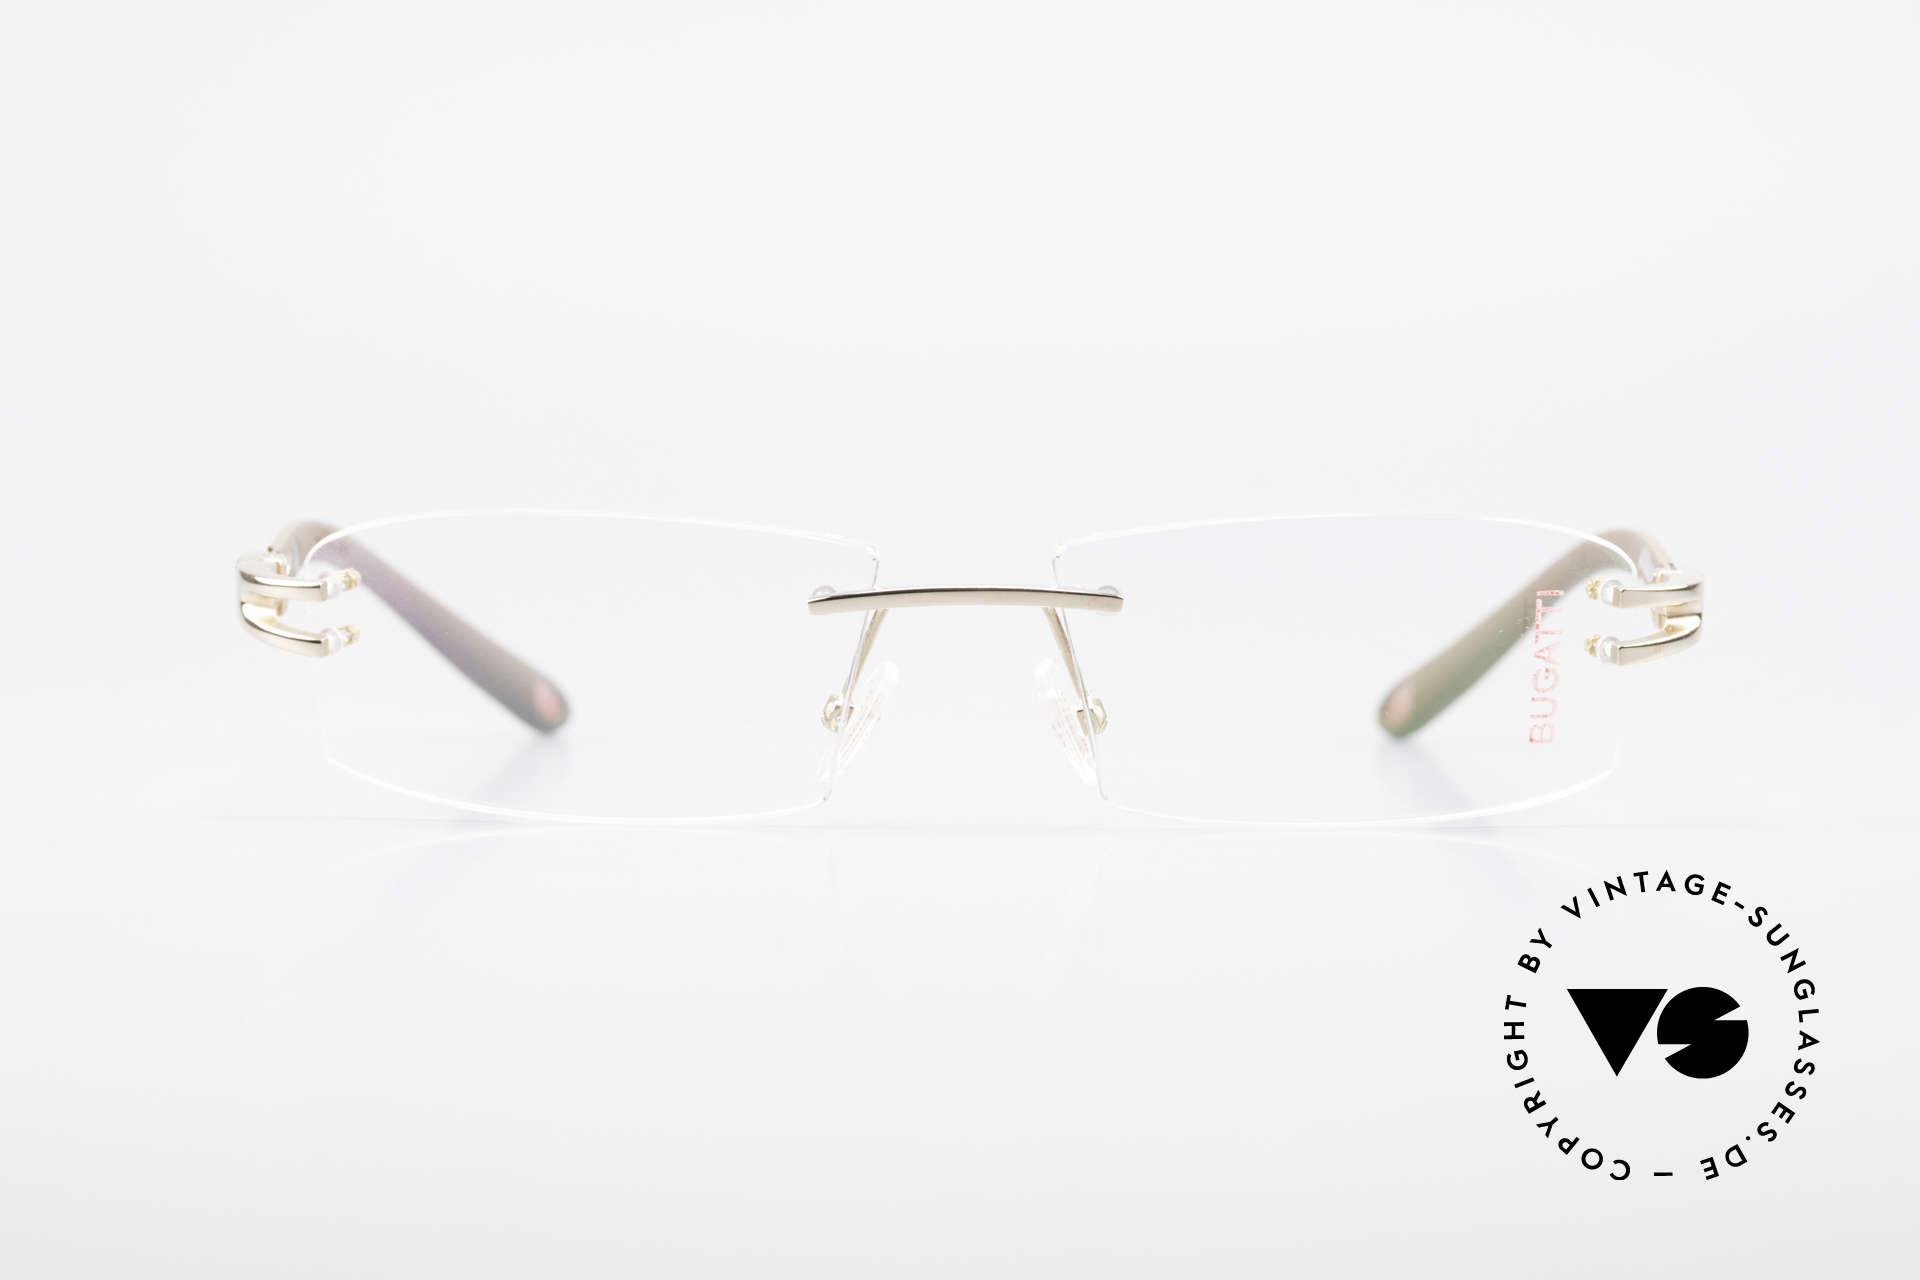 Bugatti 464 Rimless Glasses Carbon Gold, sporty frame and lens design ... striking masculine, Made for Men